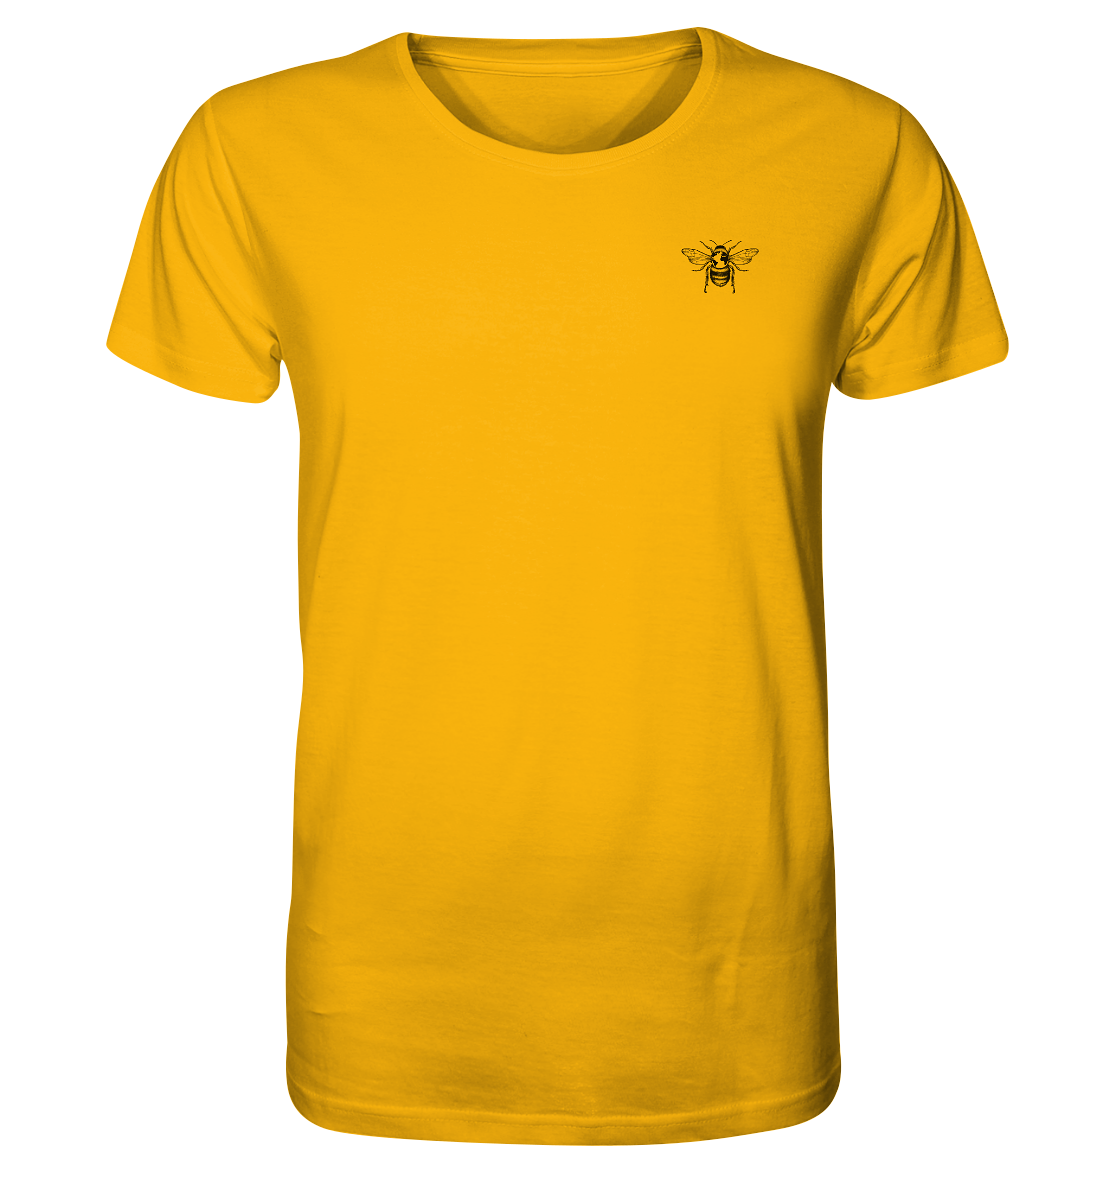 front-organic-shirt-fab40d-1116x.png